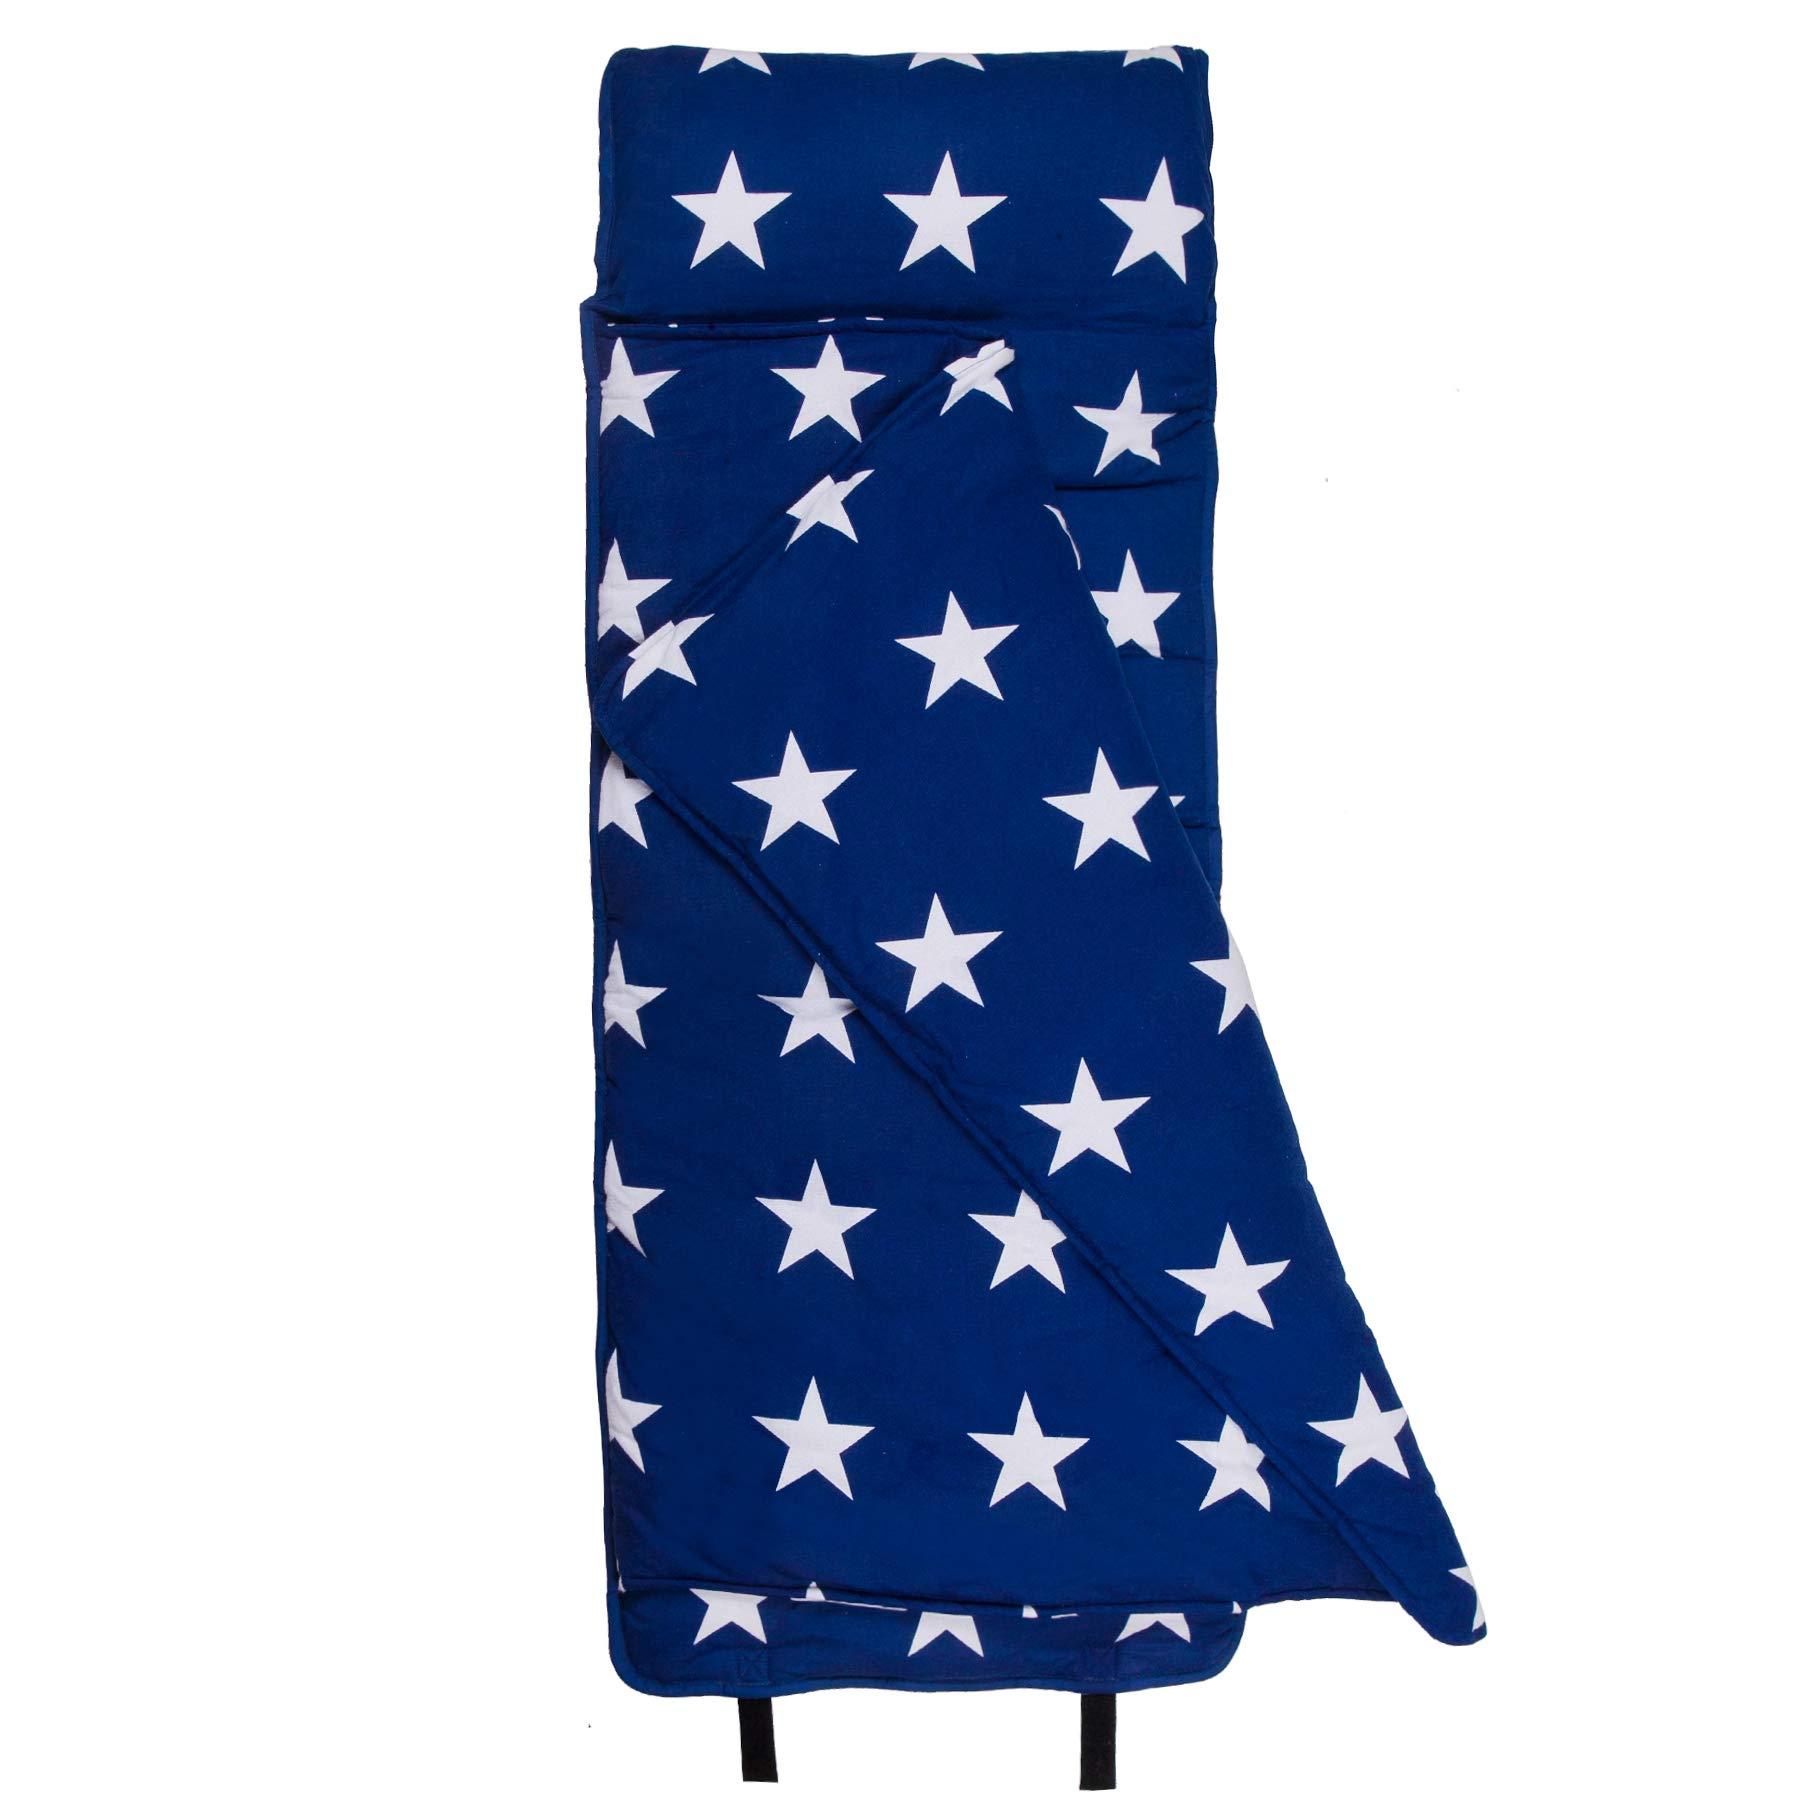 Wildkin Nap Mat, Blue & White Stars